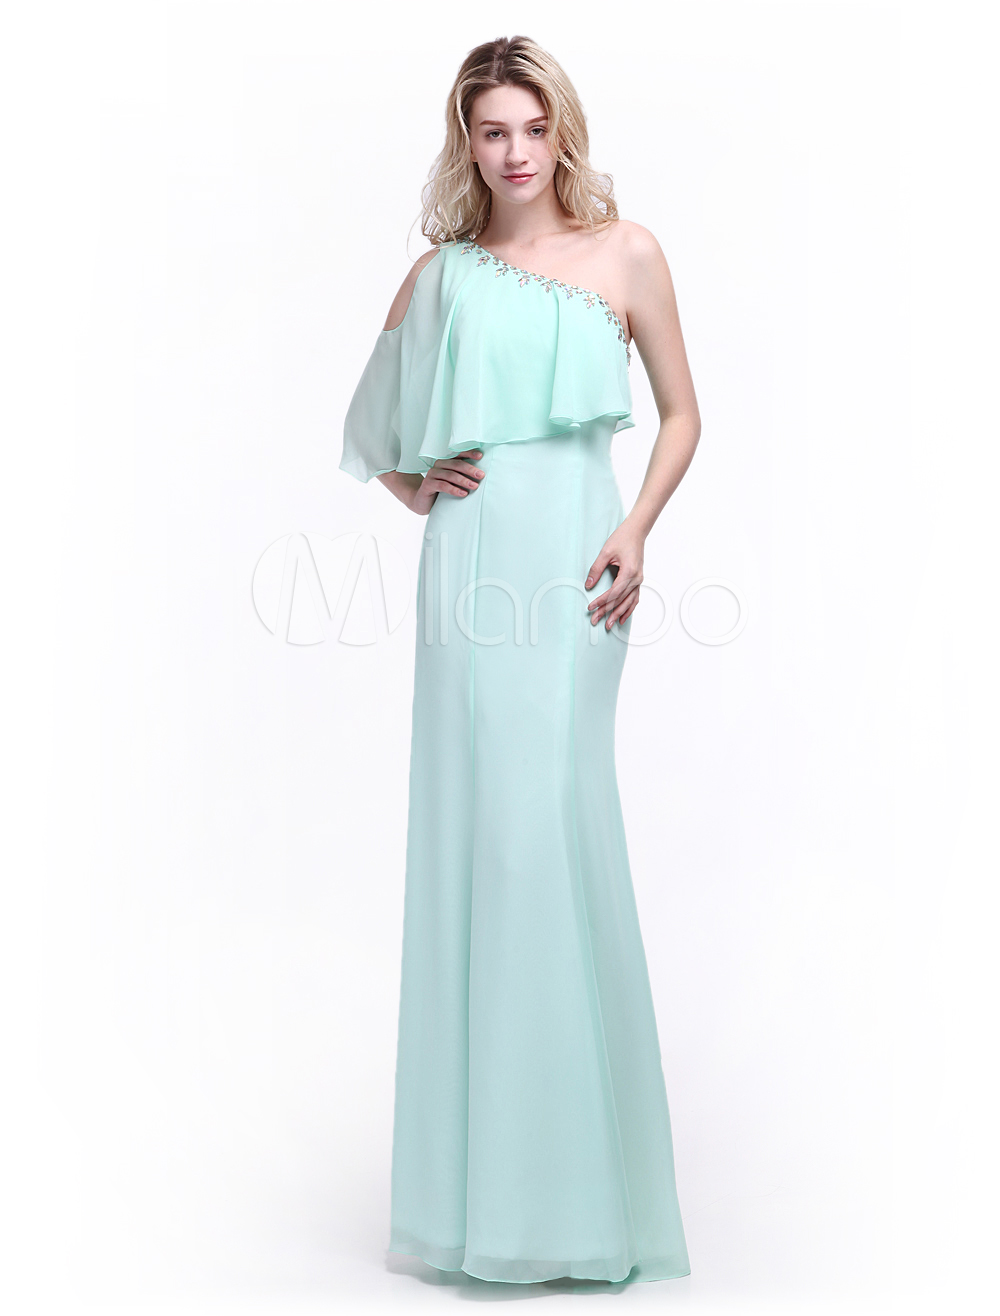 Mint Green Bridesmaid Dress with One-Shoulder Rhinestone Chiffon Skirt Milanoo (Wedding Bridesmaid Dresses) photo